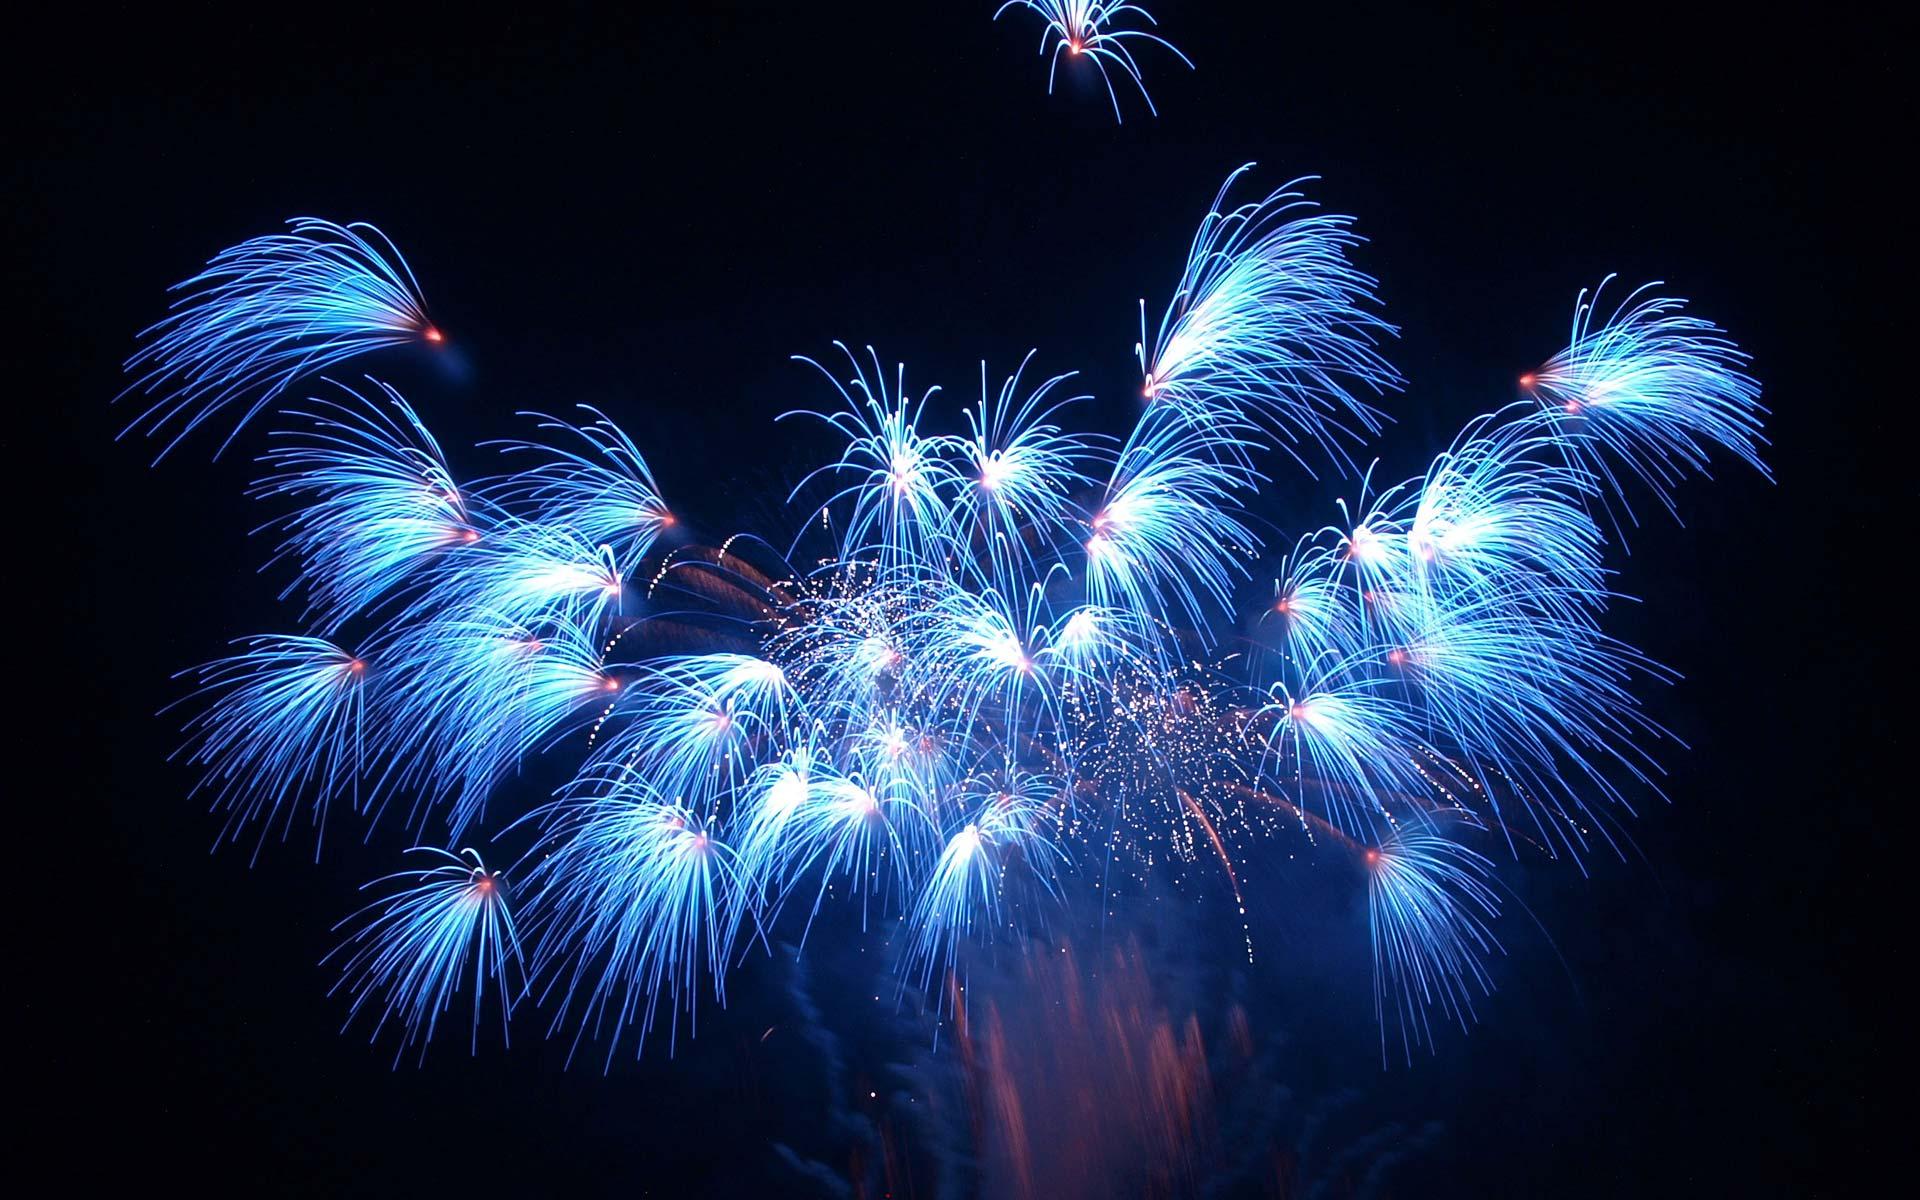 Fireworks Hd Fireworks Background Hd Wallpaper Wpt8404694   Diwali 1920x1200